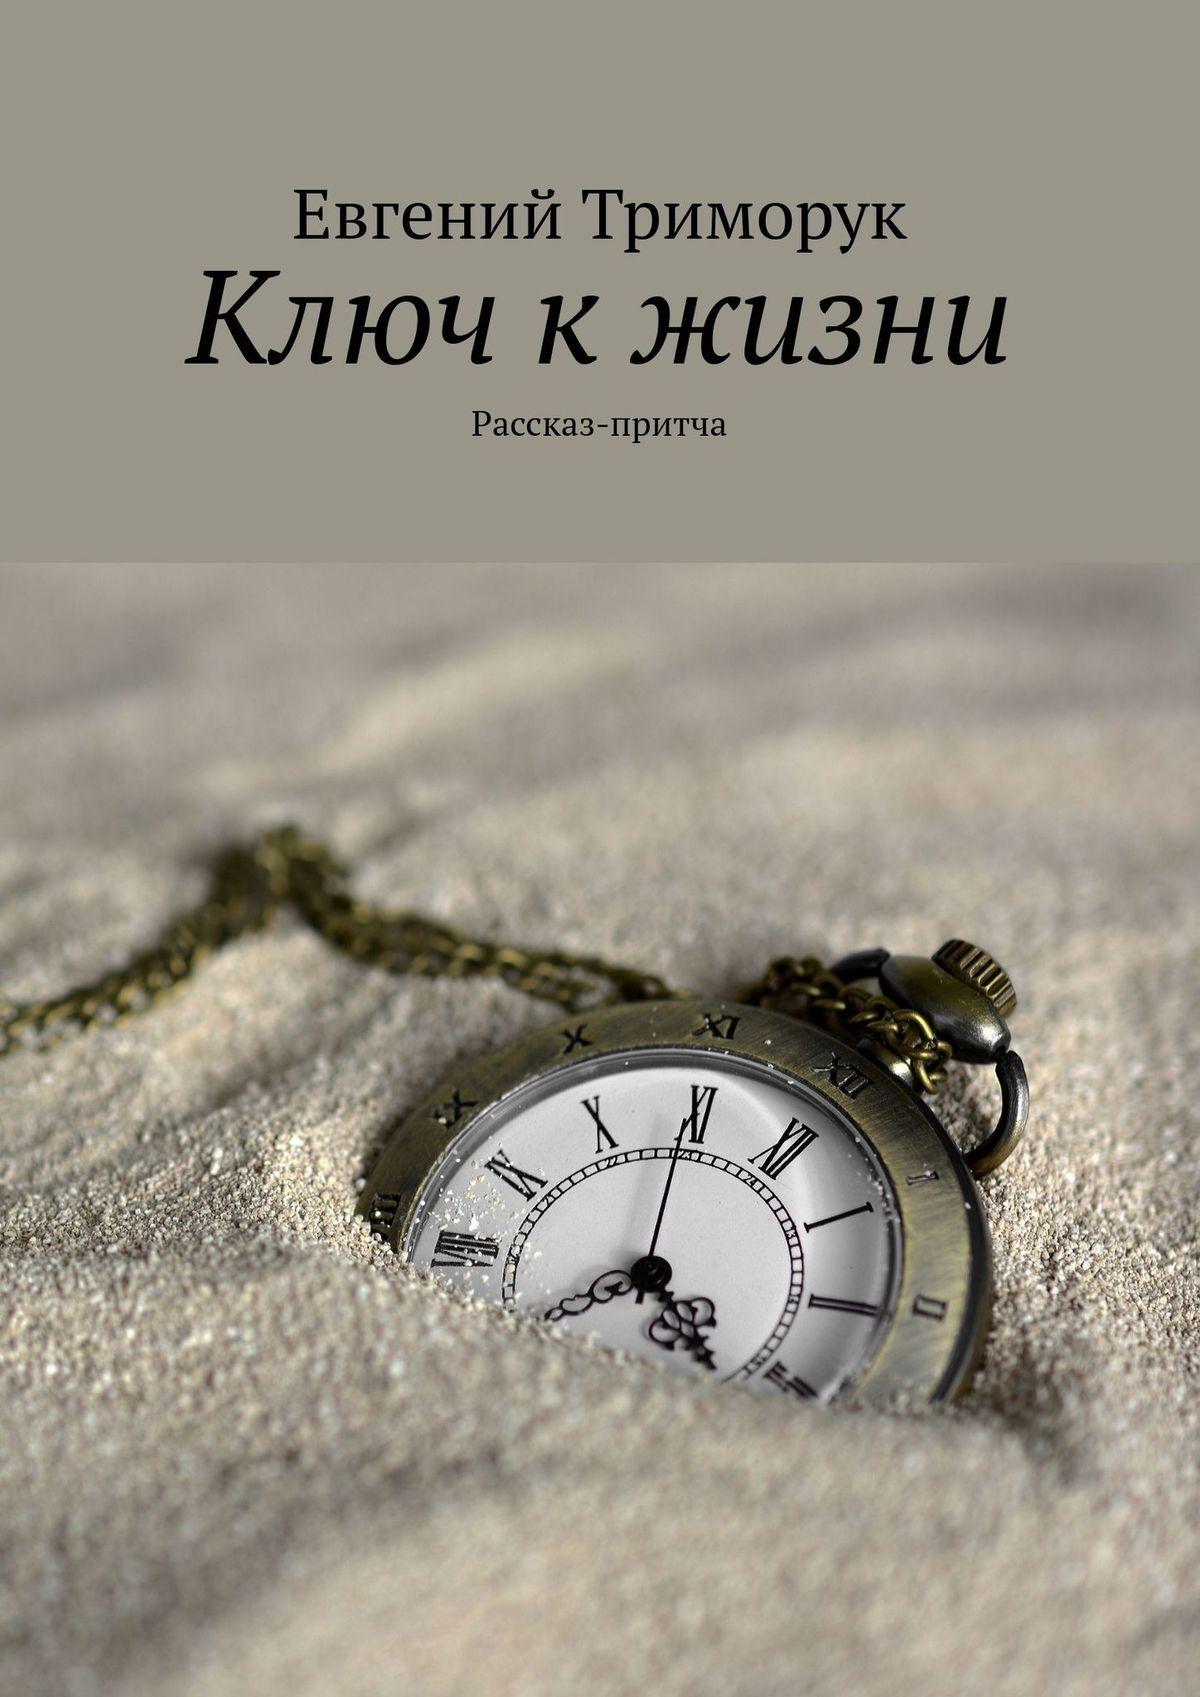 Евгений Триморук Ключ к жизни. Притча афинагор ключи к жизни